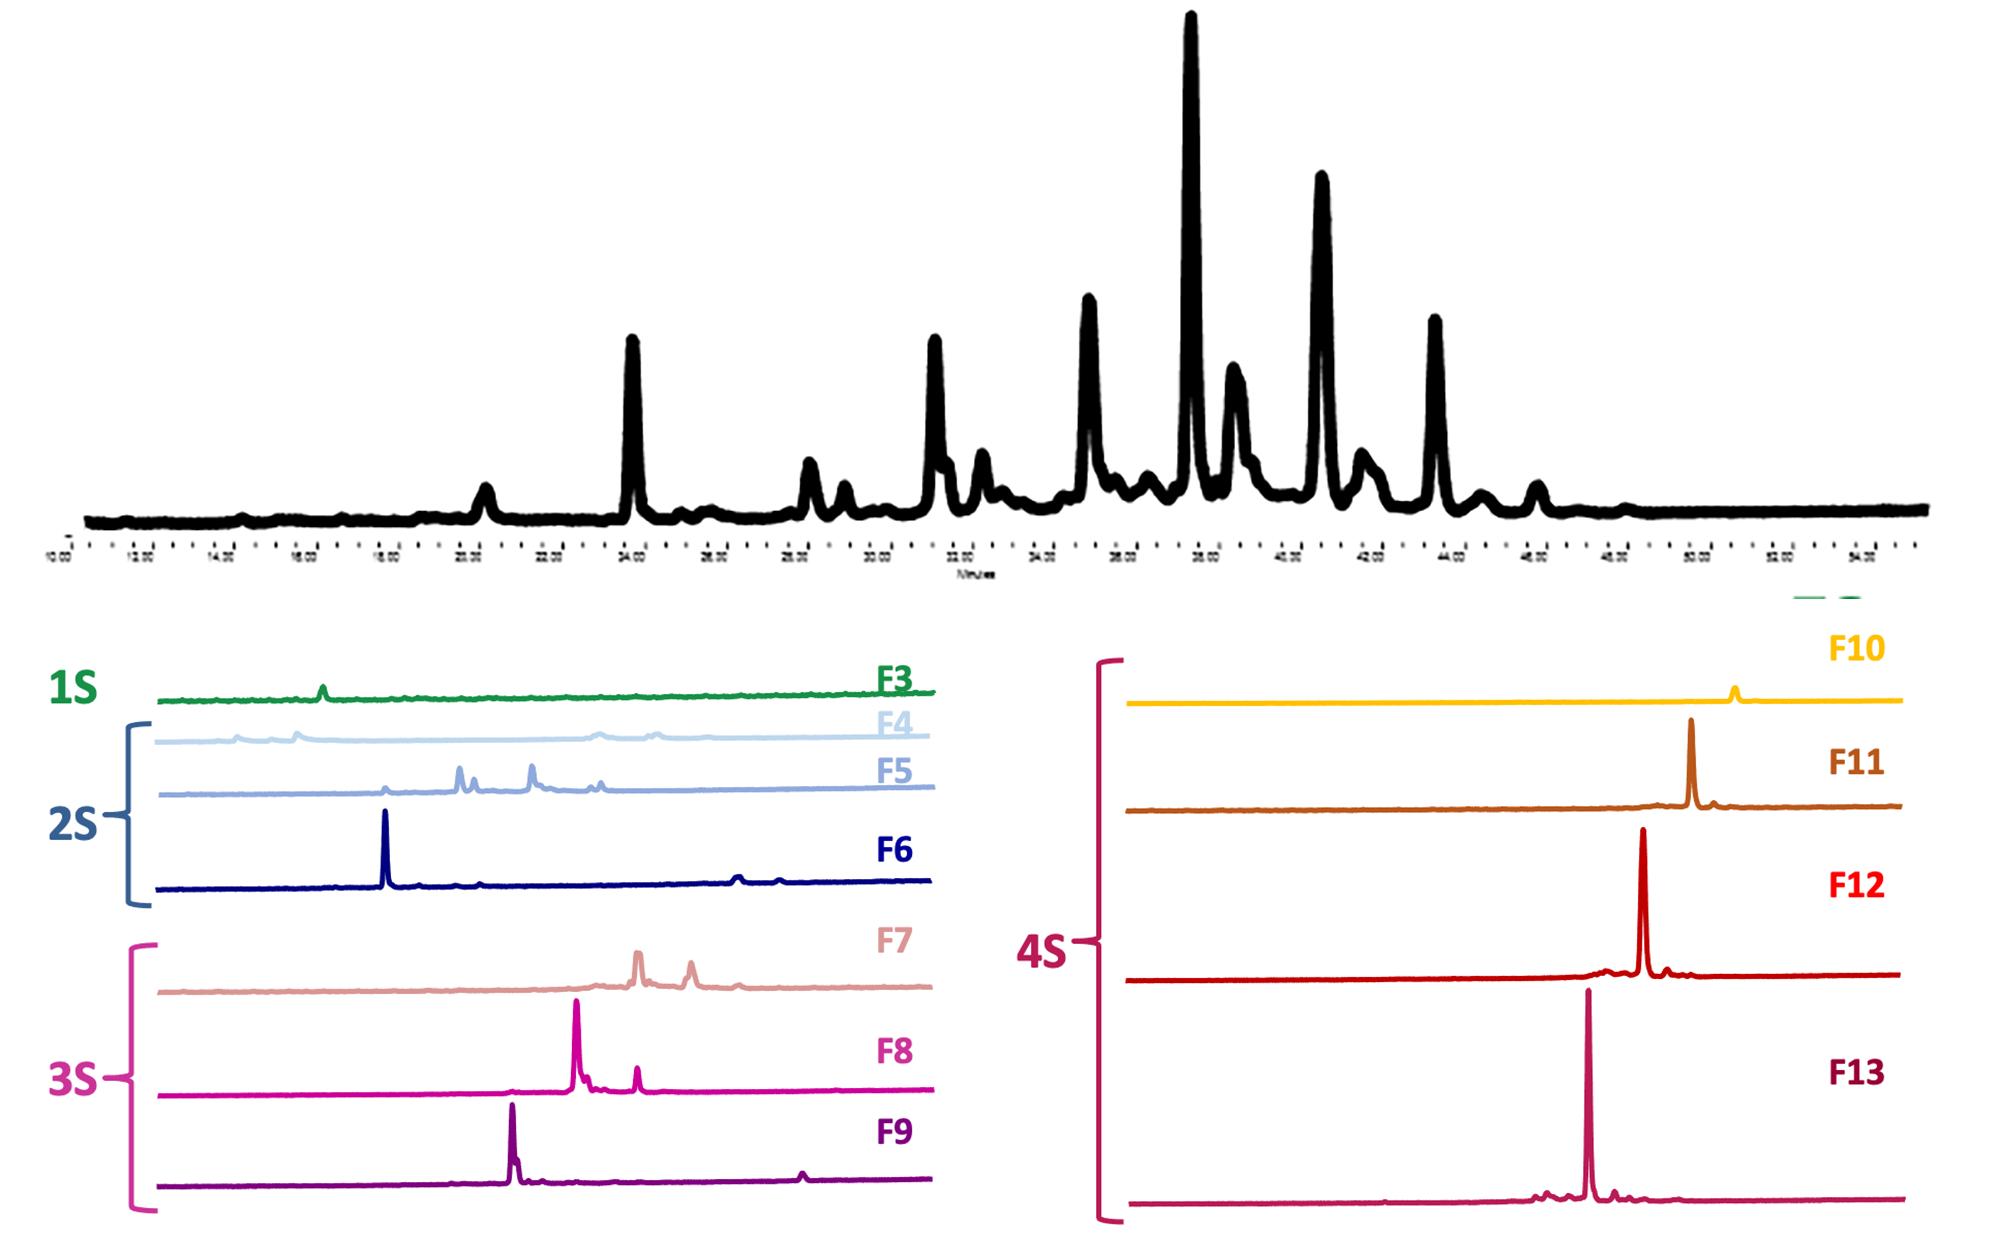 wax glycan analysis2 image